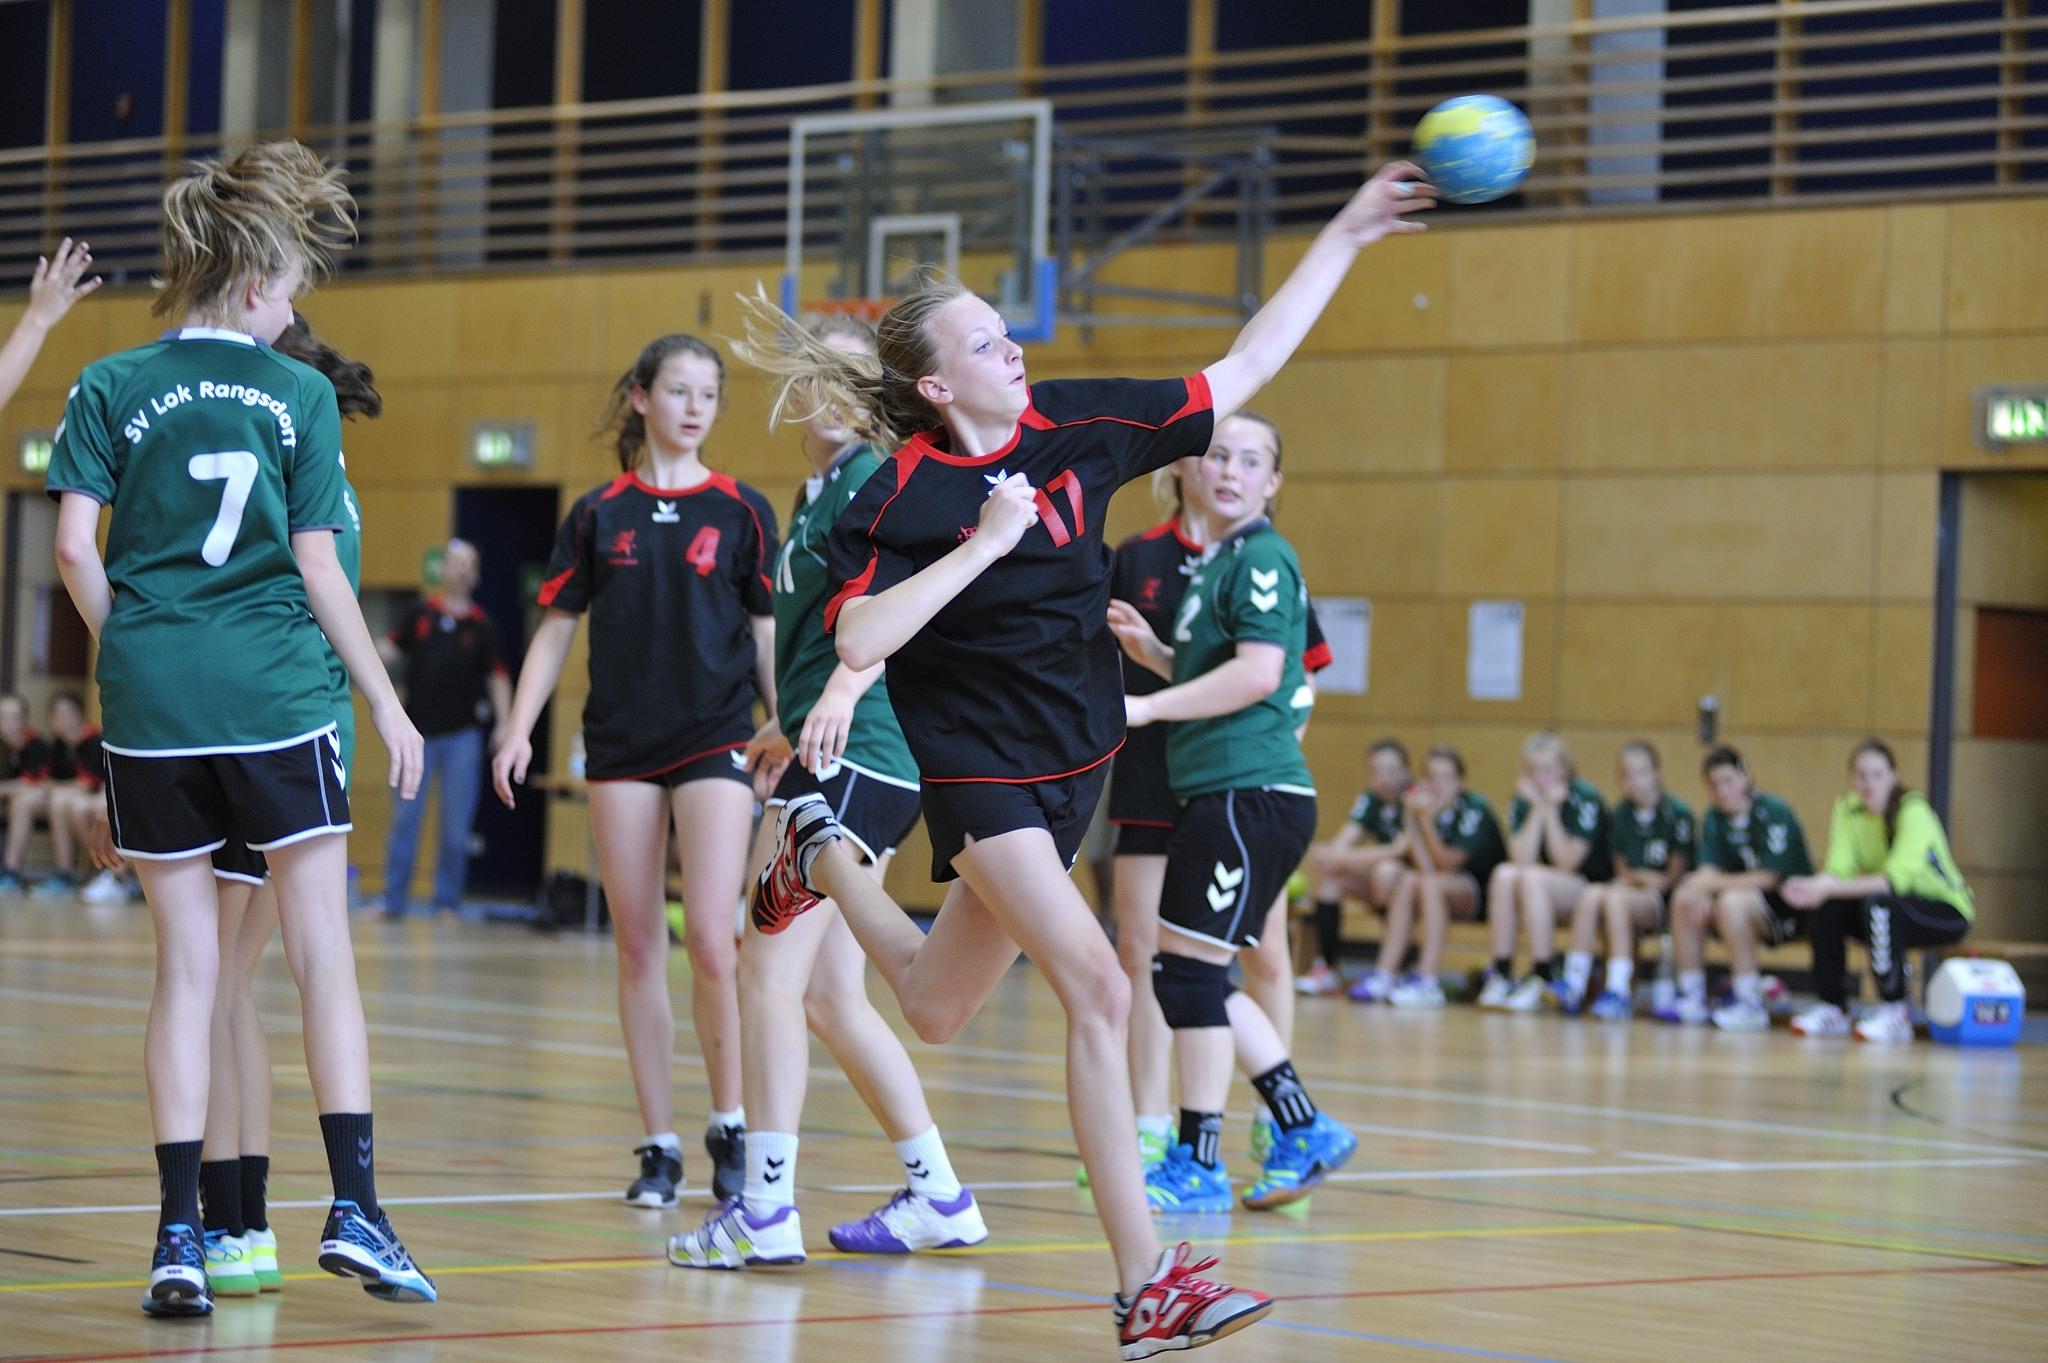 Pfefferwerk Handball